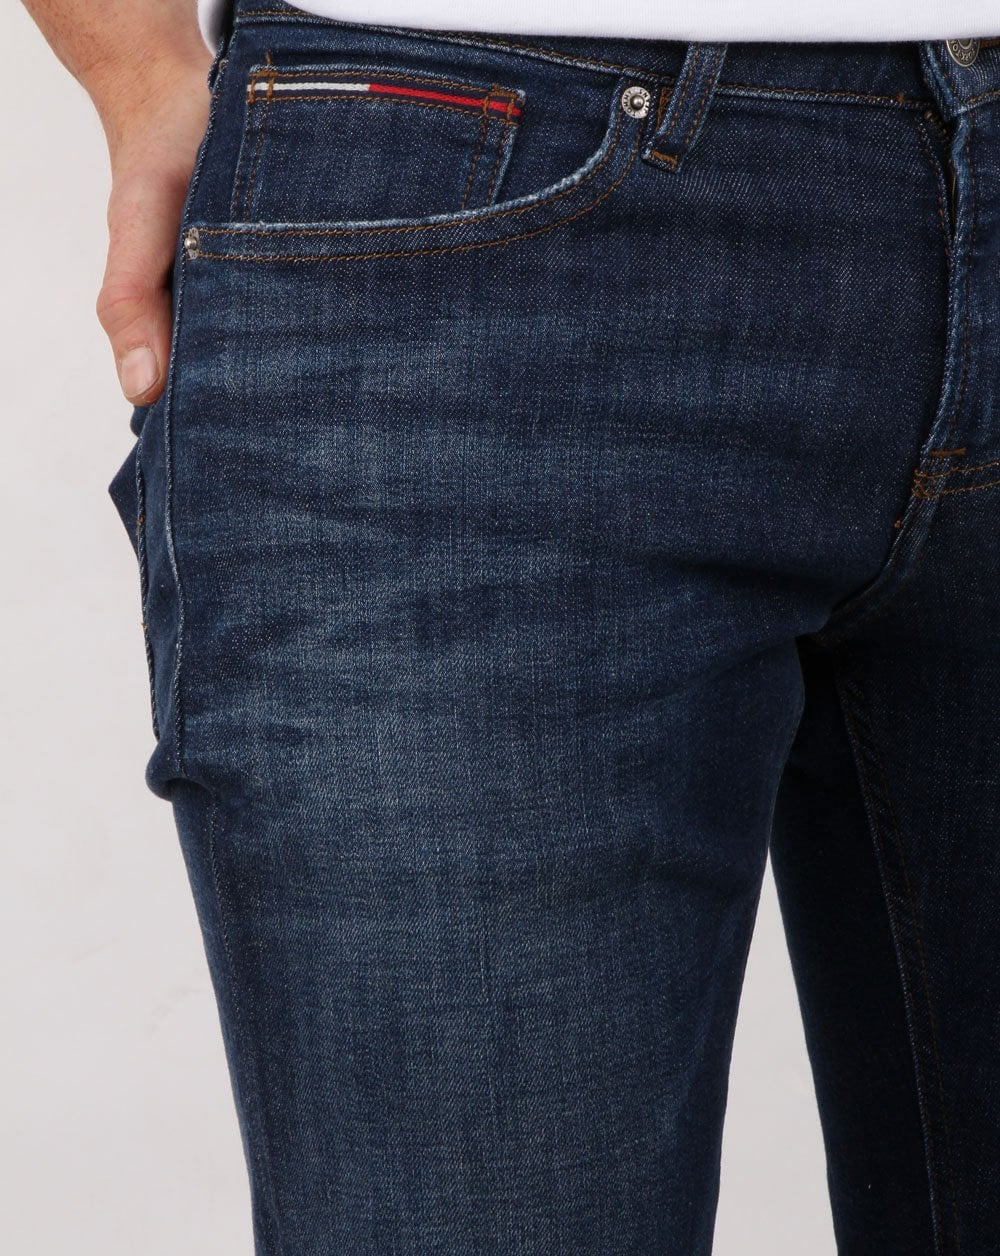 82085a318 Tommy Hilfiger, Slim Scanton Stretch, Dark Blue Jean | 80s casual